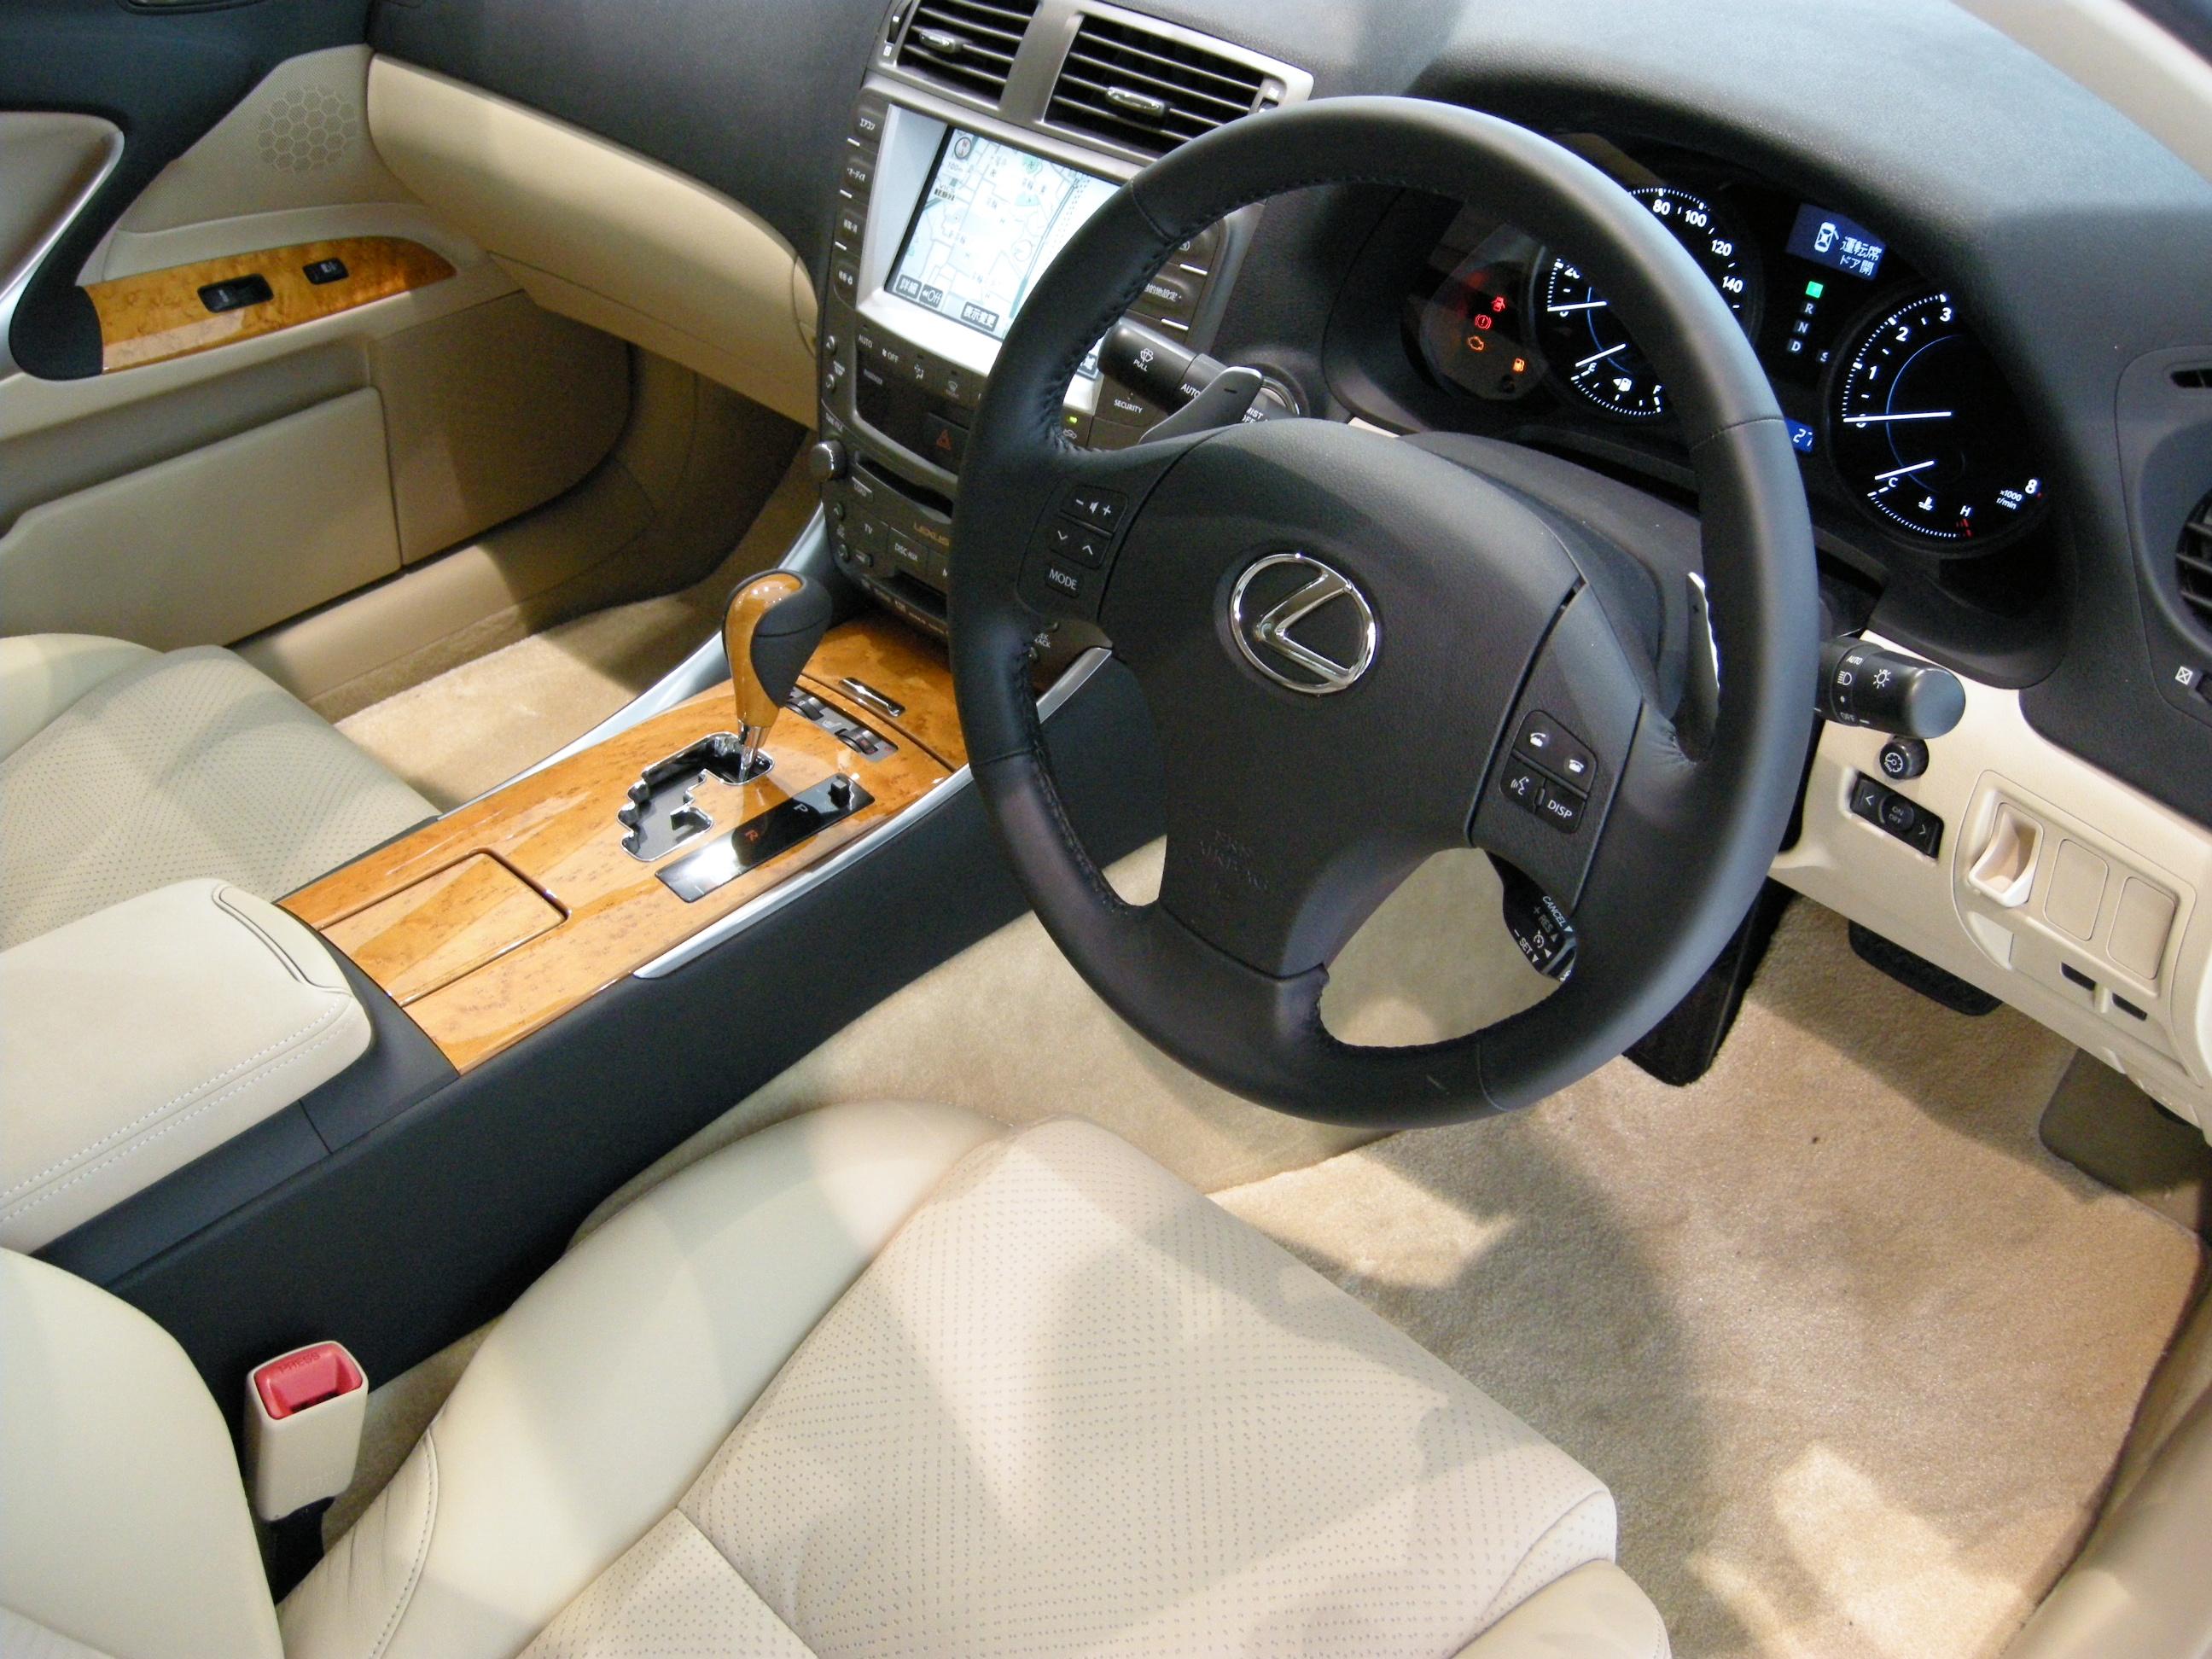 100 White Lexus Is 250 Interior Awesome Lexus Is 2015 On Lexus Is Interior On Cars Design